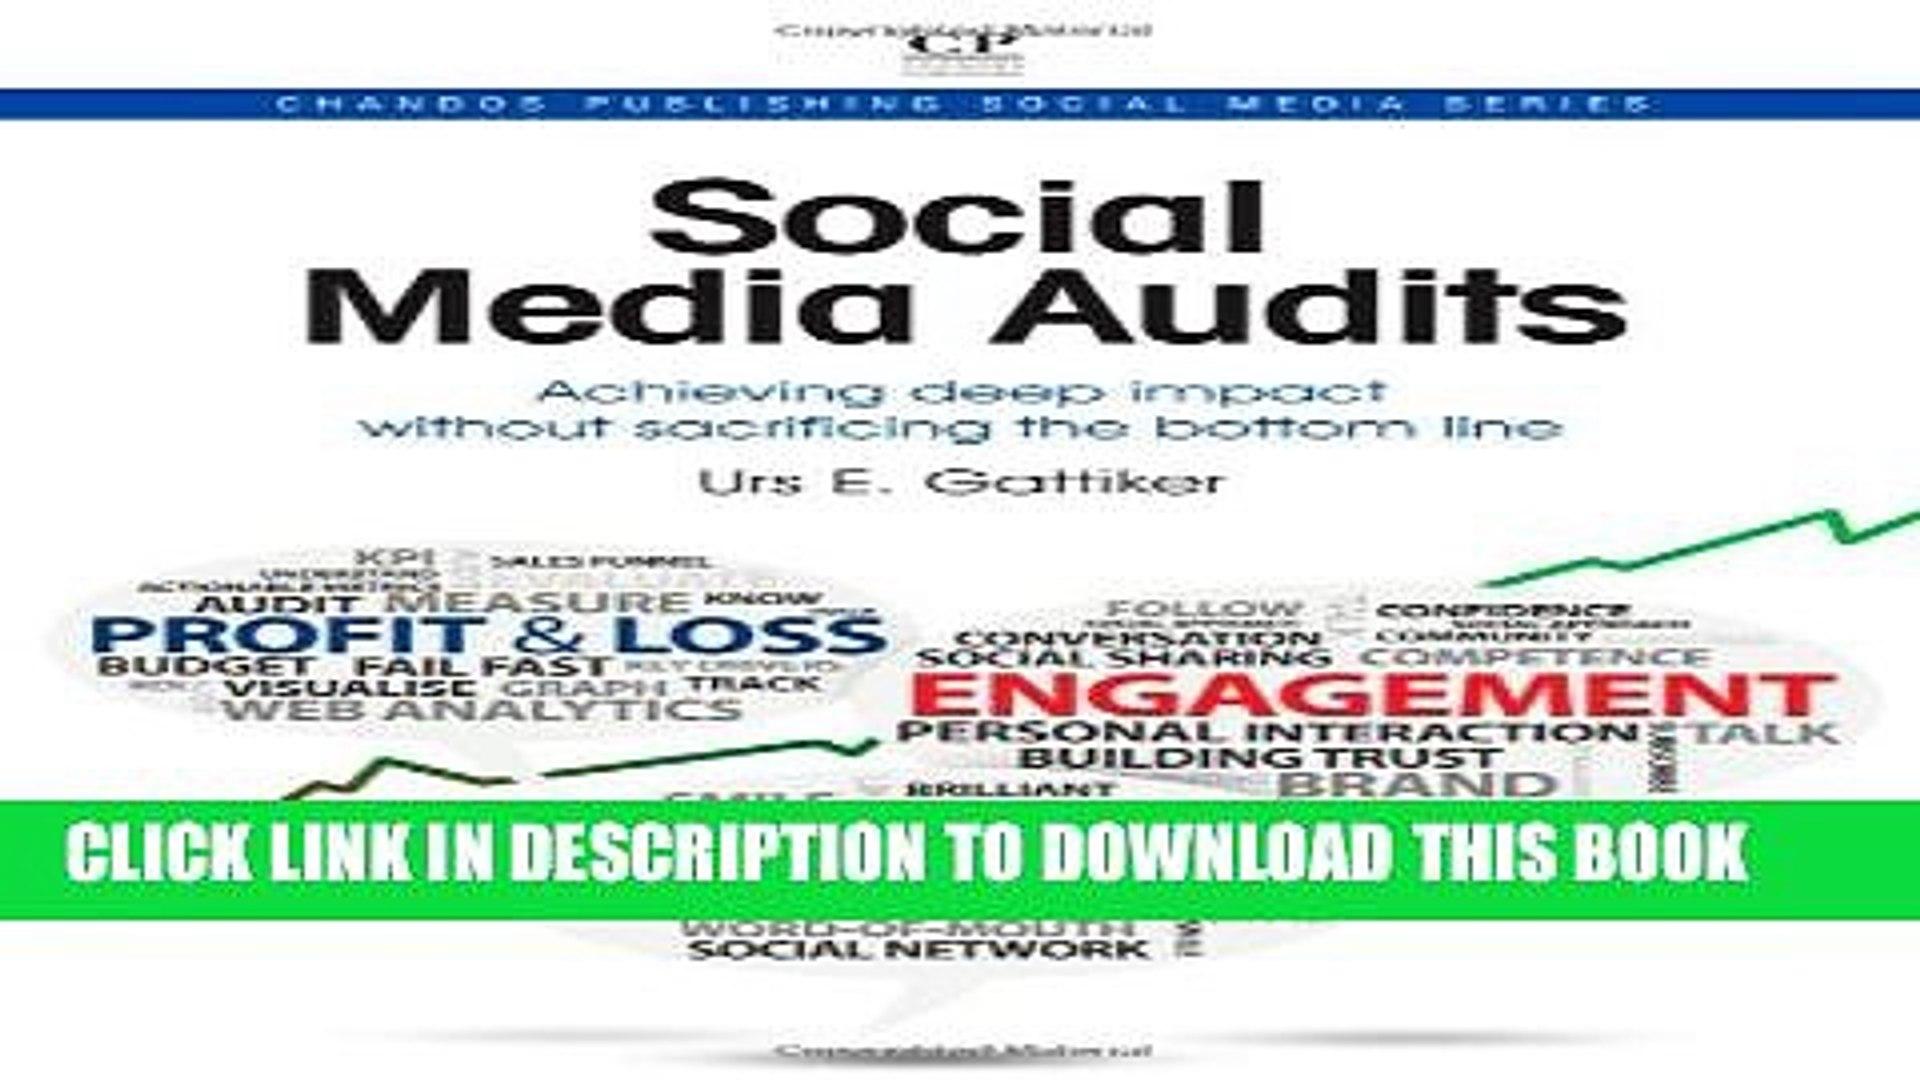 [PDF] Social Media Audits: Achieving Deep Impact Without Sacrificing the Bottom Line (Chandos